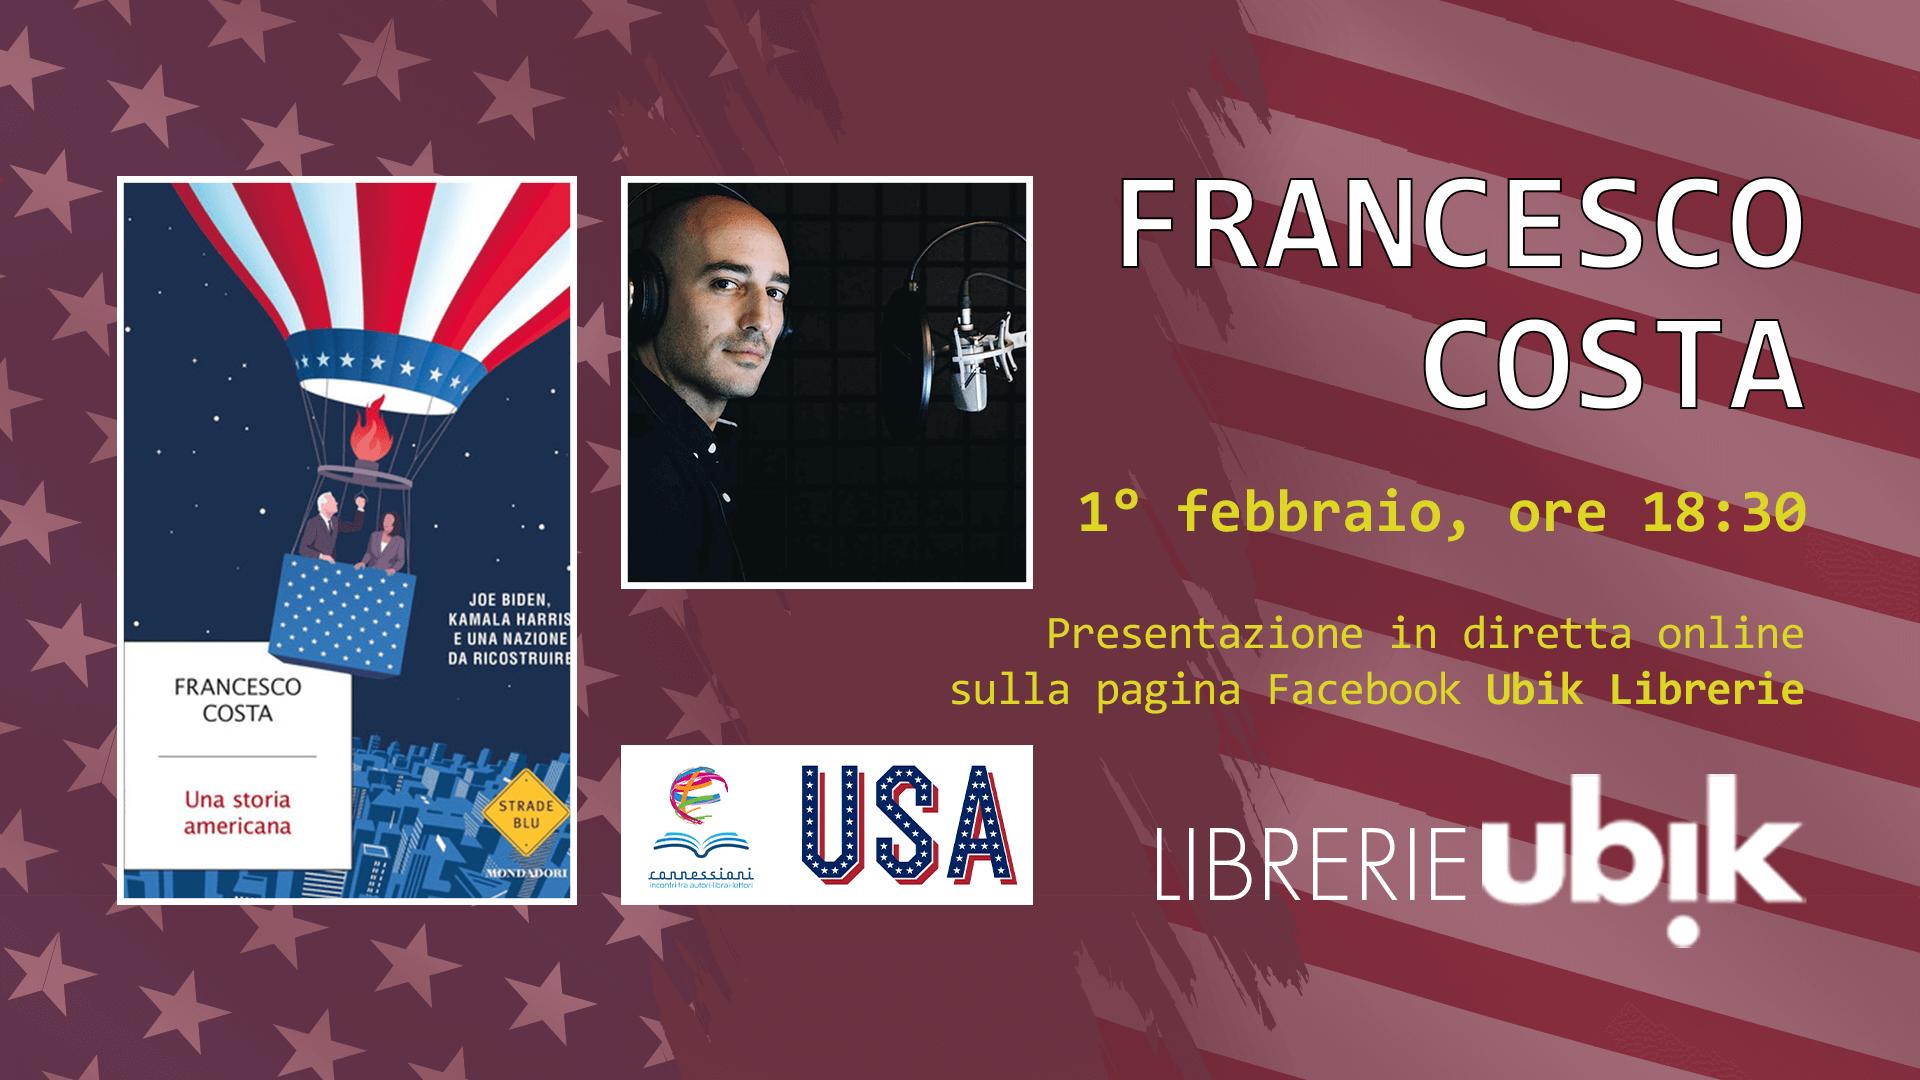 FRANCESCO COSTA presenta in diretta online